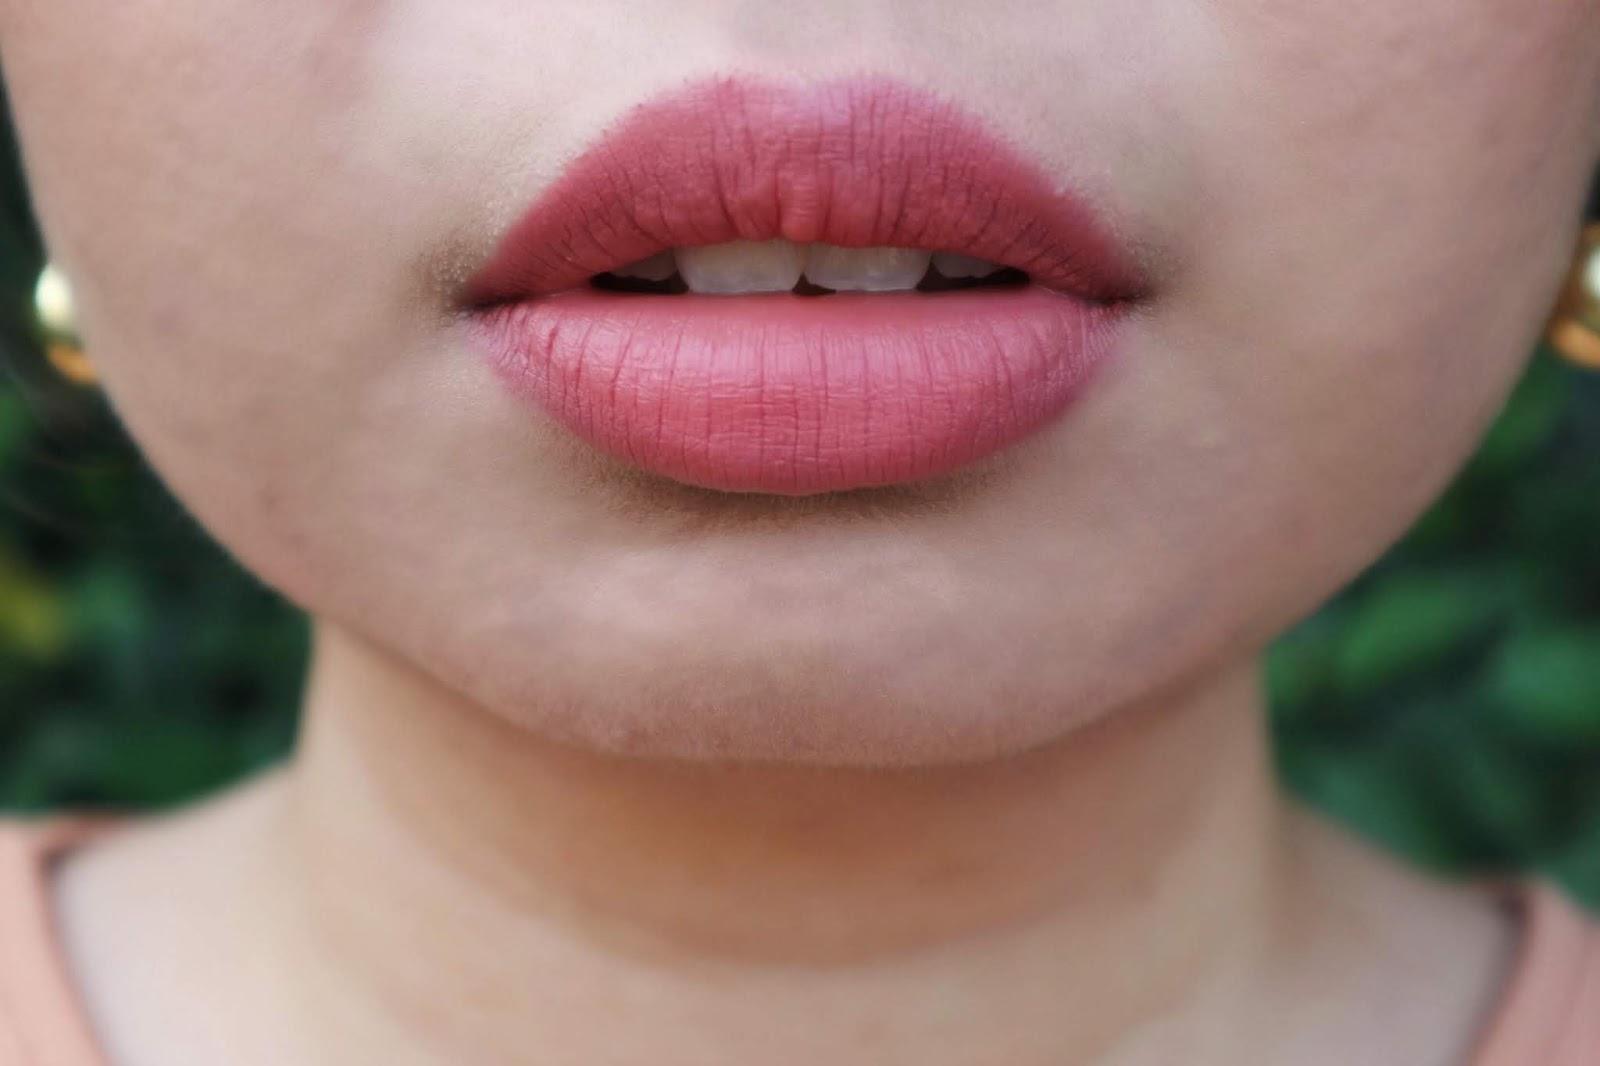 Kris Matte Mattic Lipstick in Life (Pink) Lip Swatch